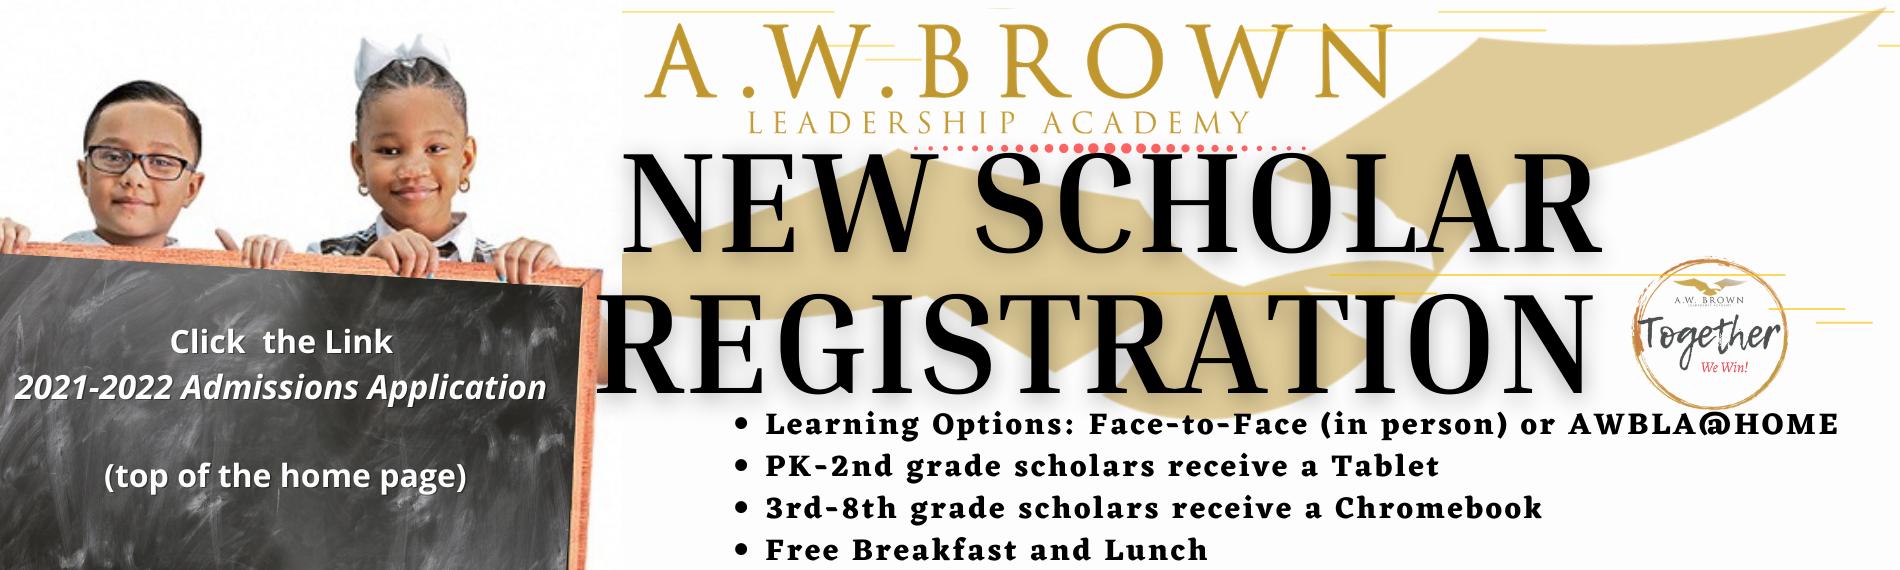 New Scholar Registration